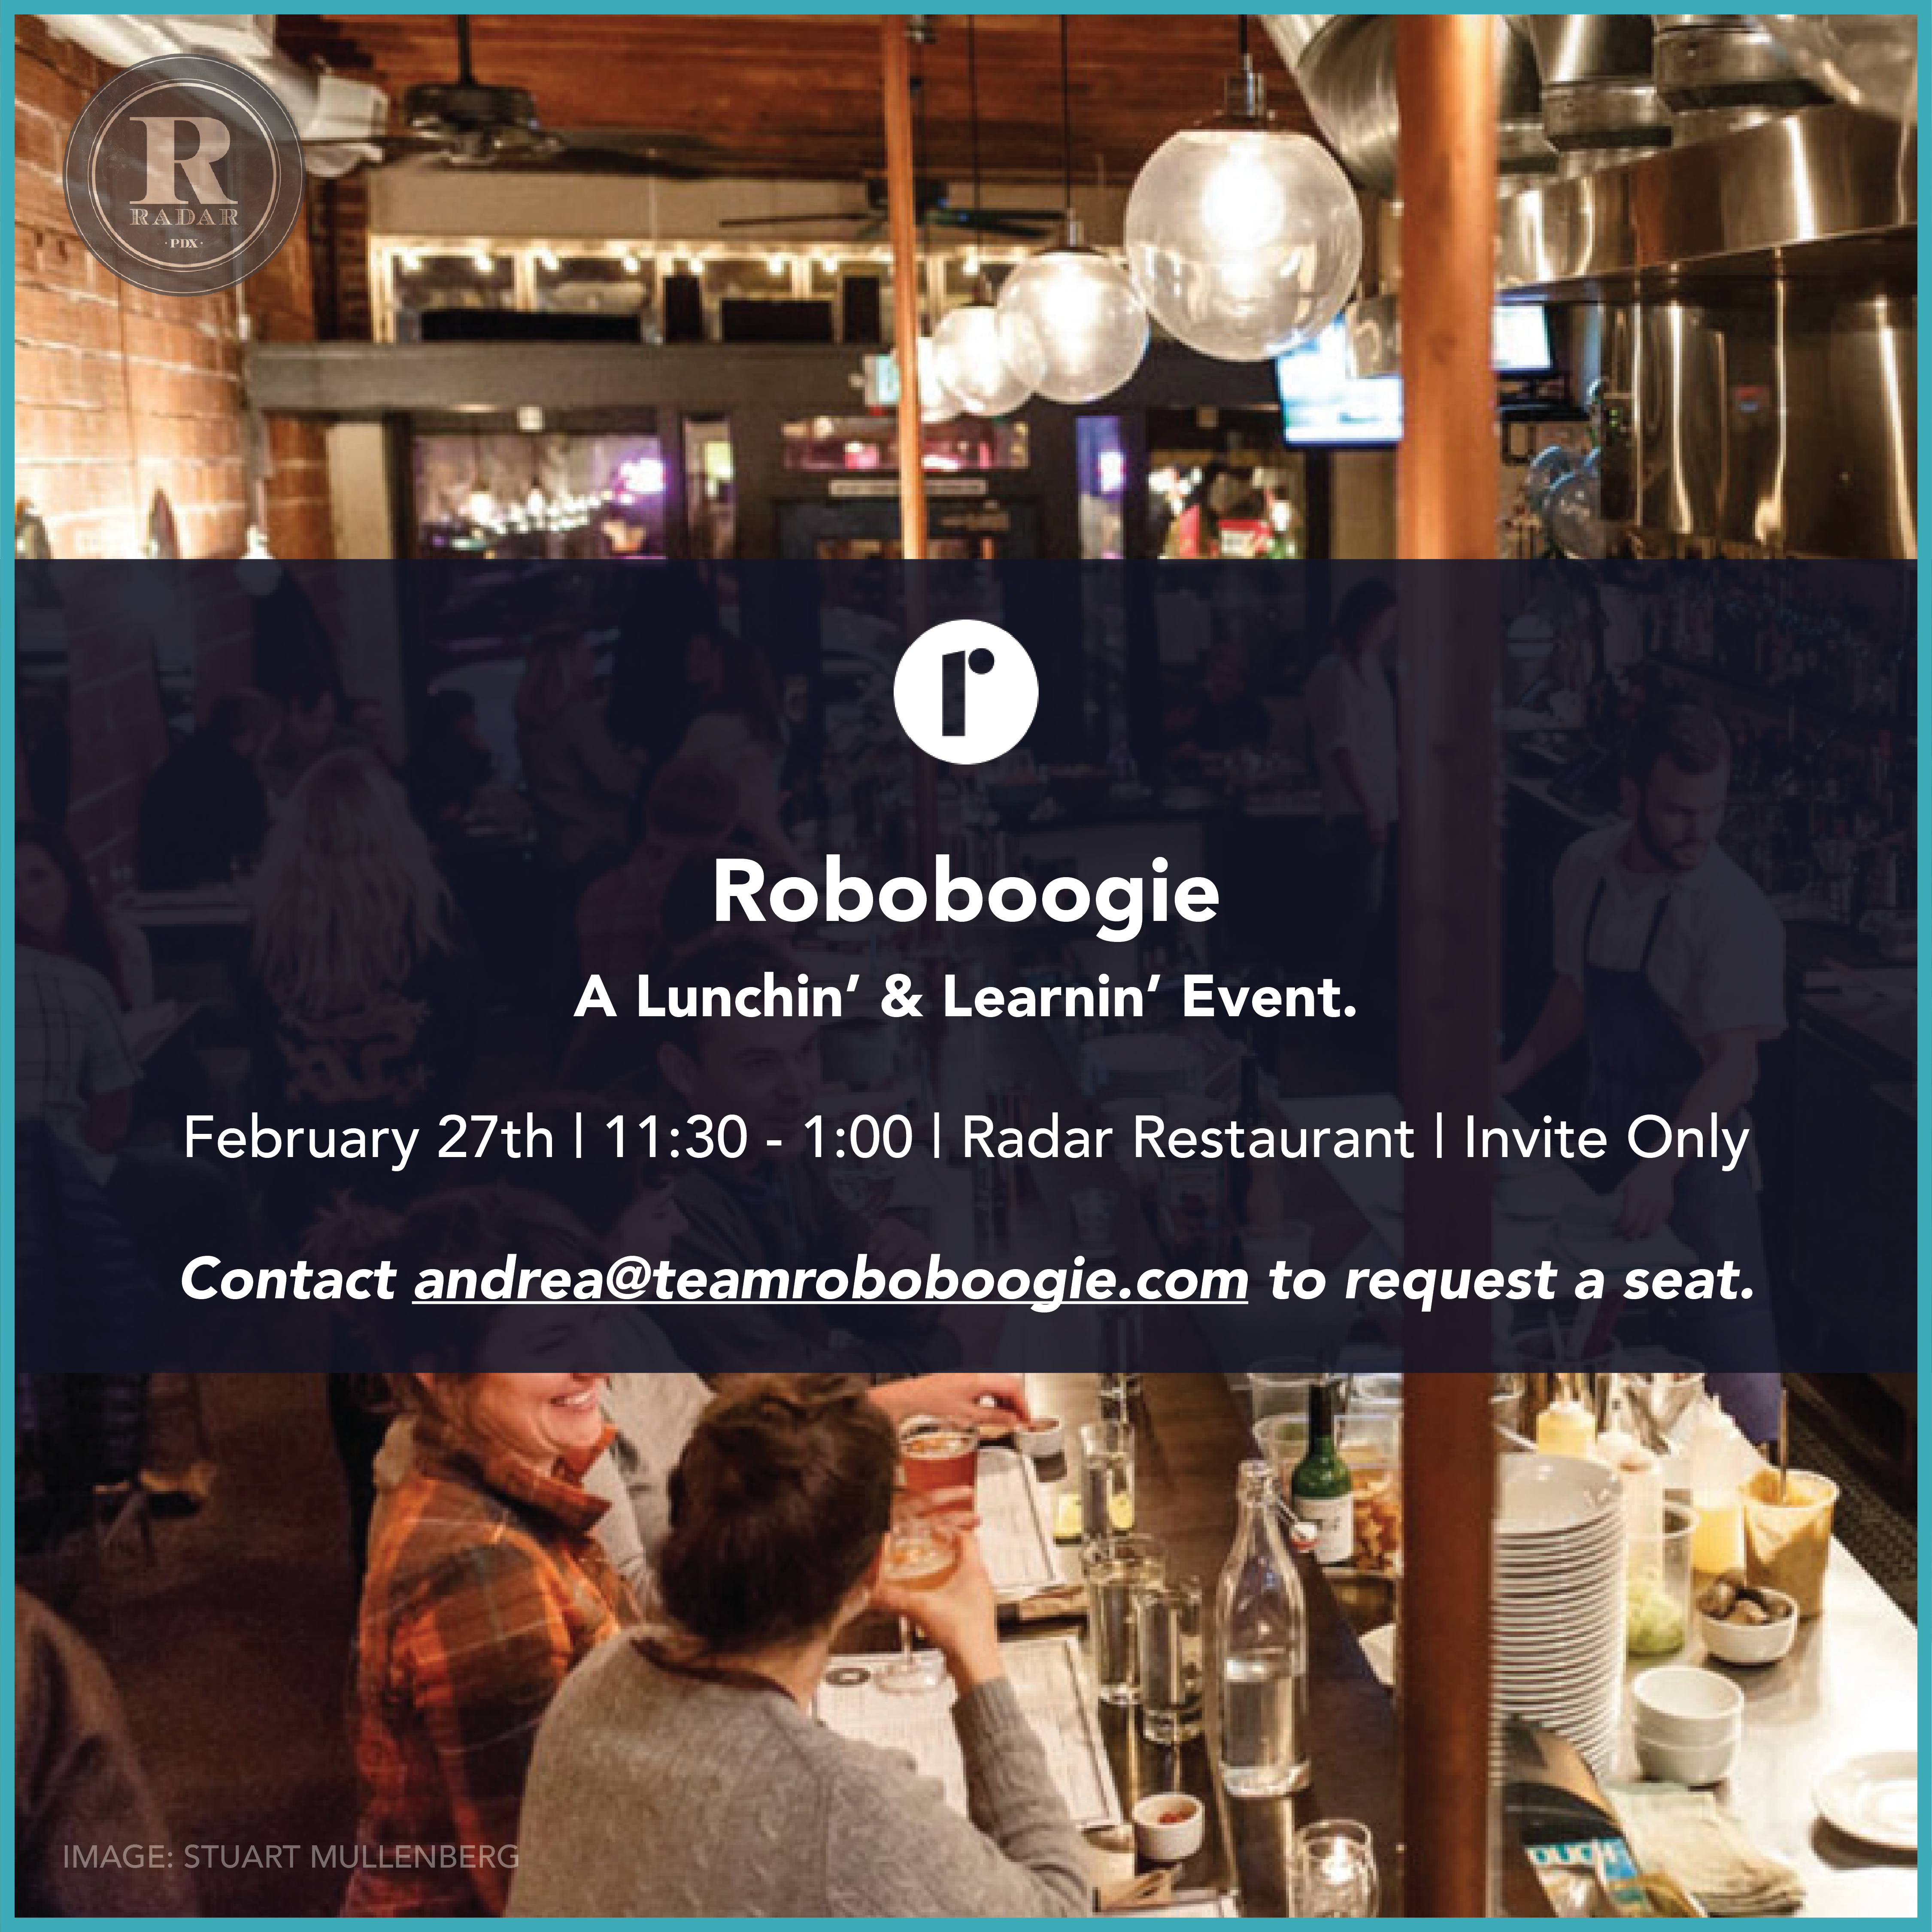 Roboboogie + Radar: A Lunchin' & Learnin' Event